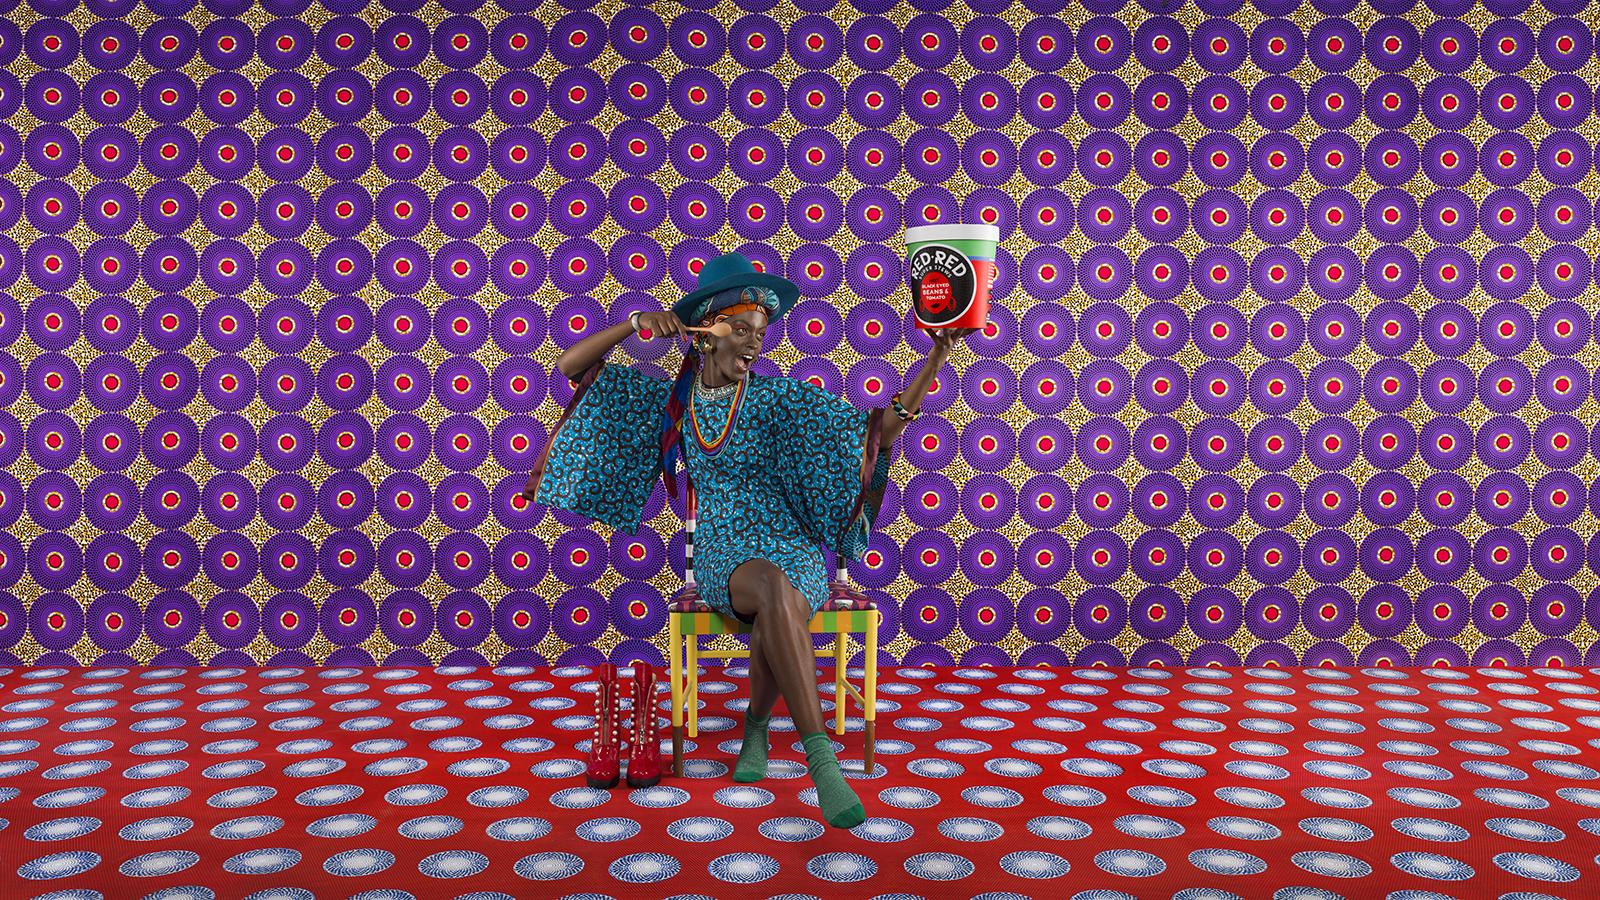 RedRed campaign, Photography: Patrice De Villiers, Styling: Samson Soboye, Model: Alisha Safo @liiissha, Chair: Yinka Ilori